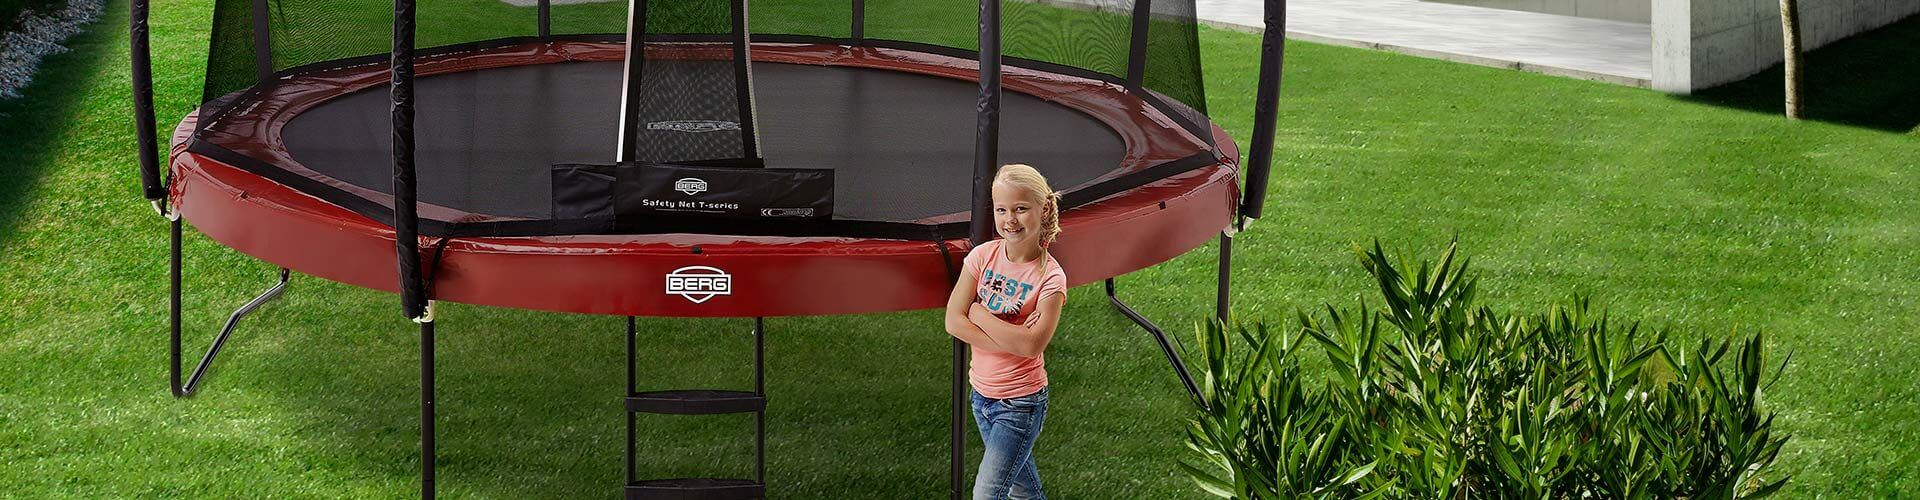 Trampolin FAQ - trampolin-profi.de